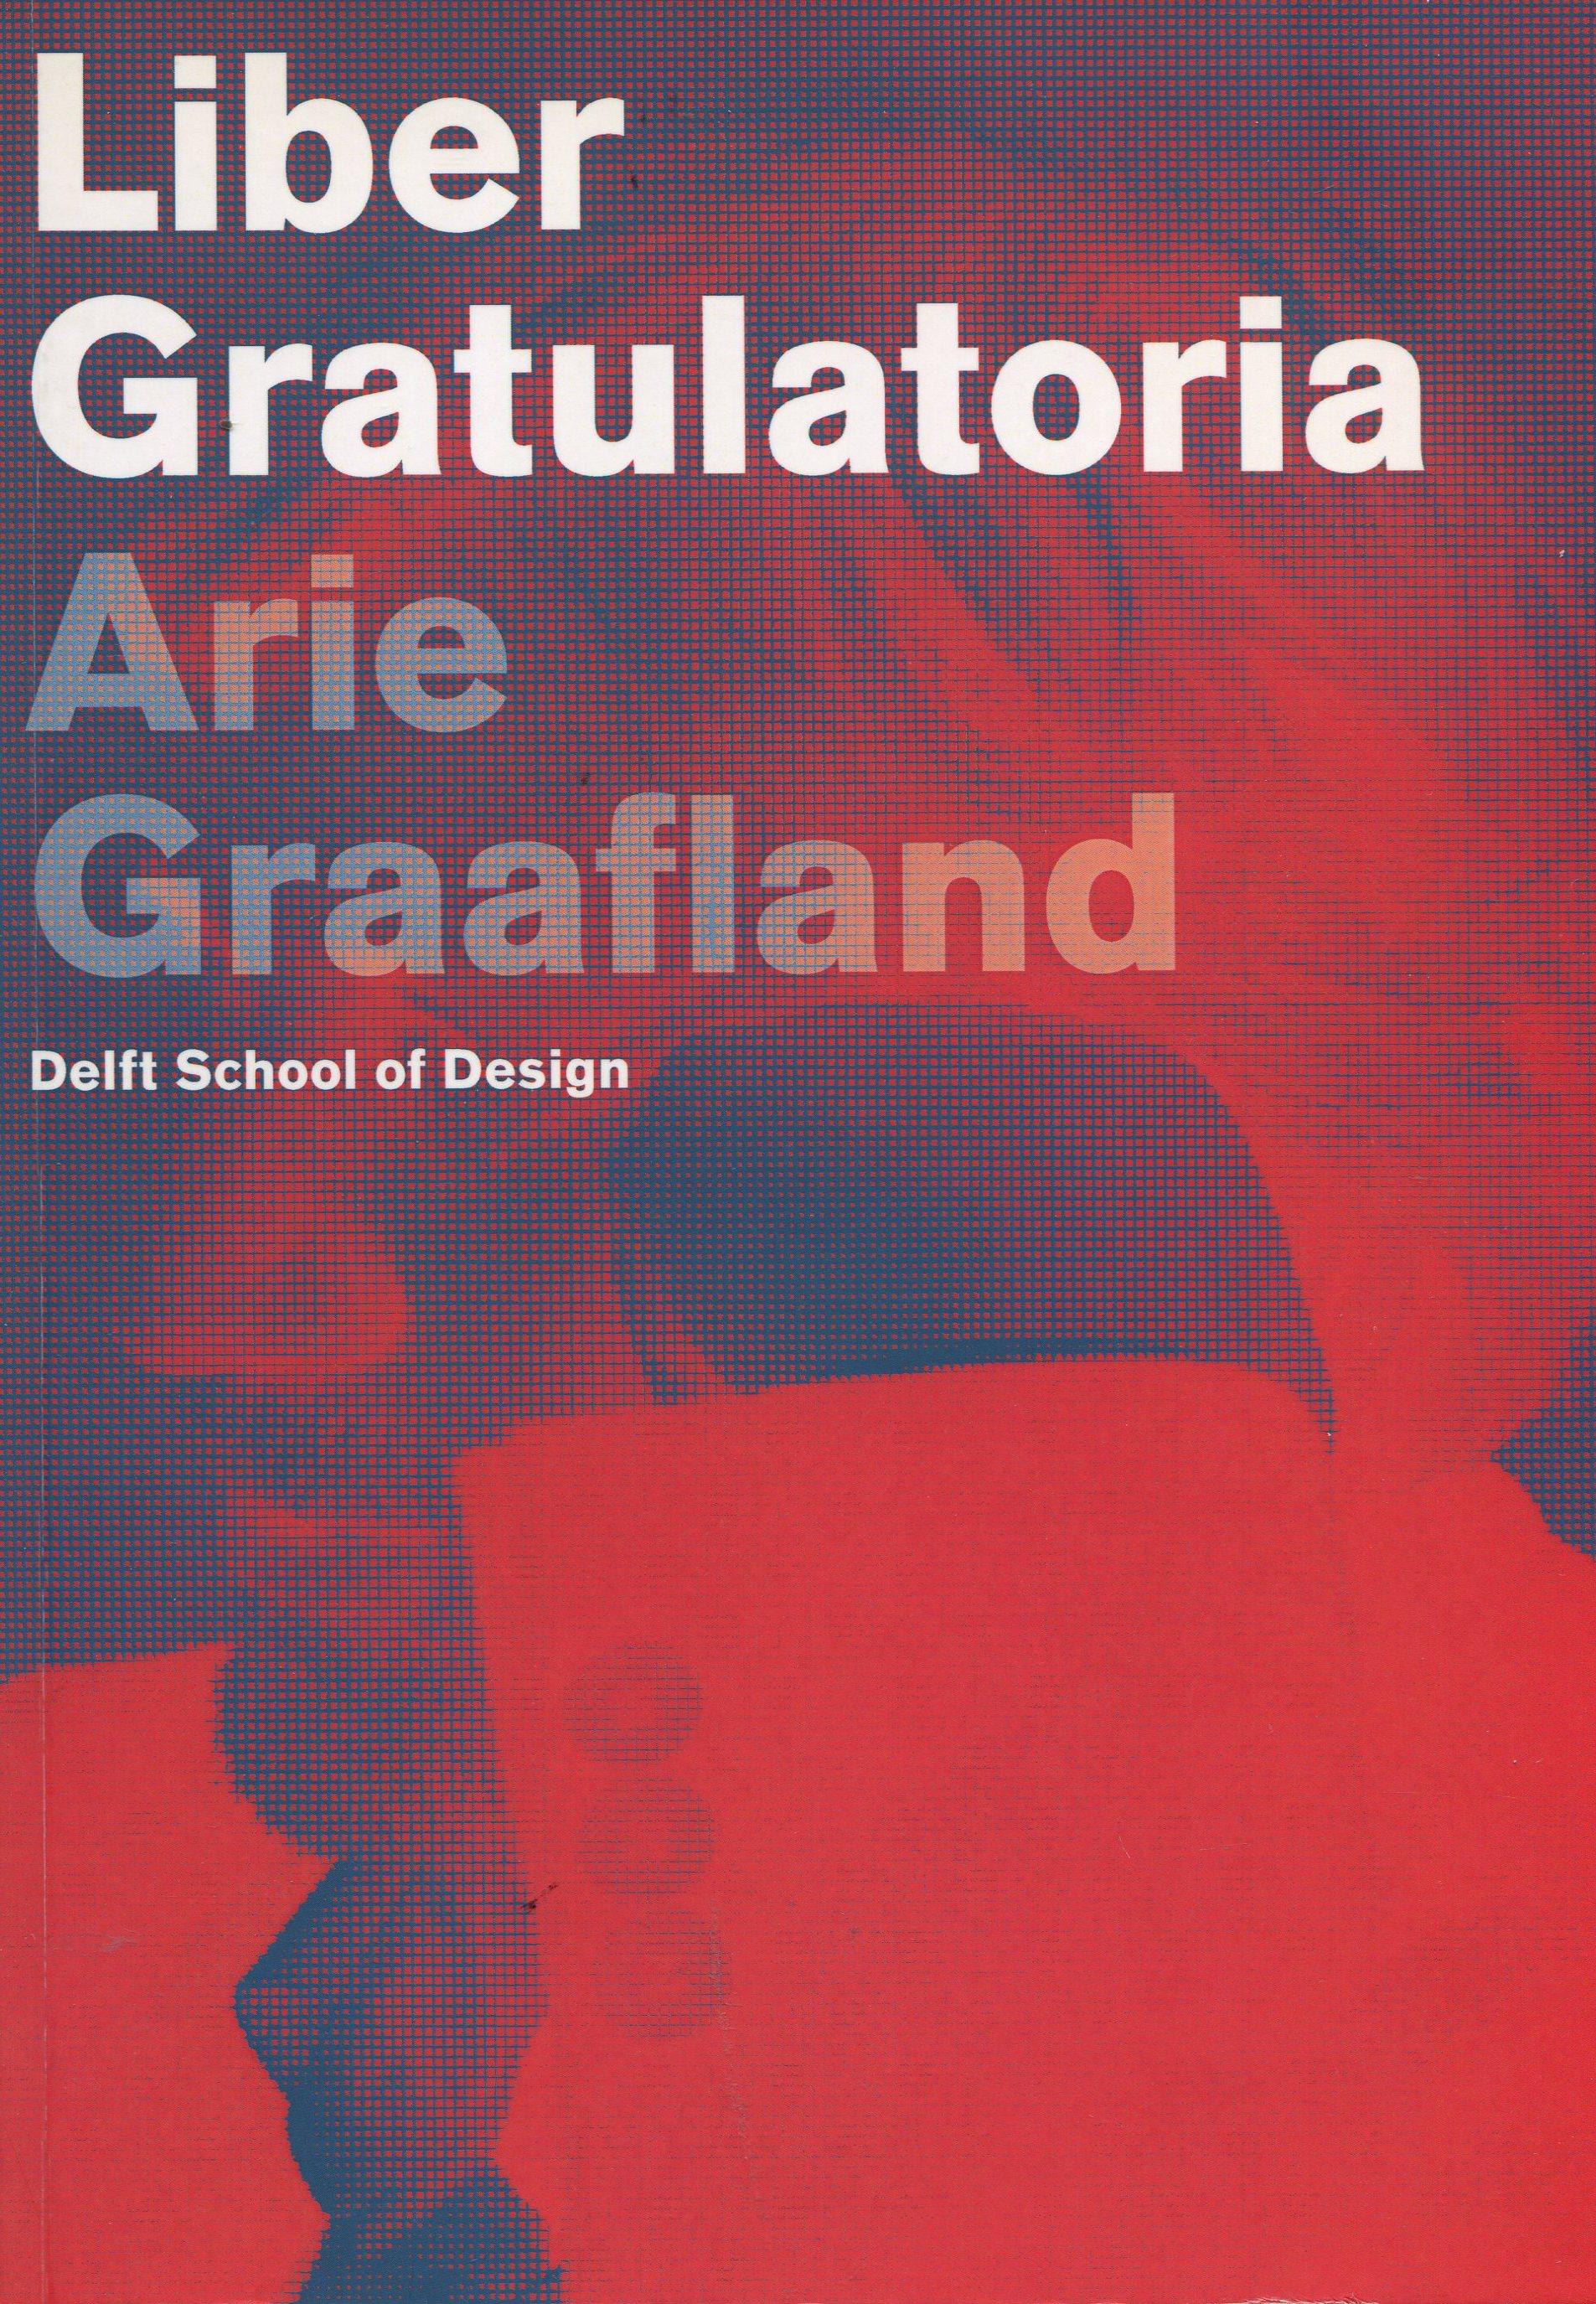 Liber Gratulatoria Arie Graafland.jpg